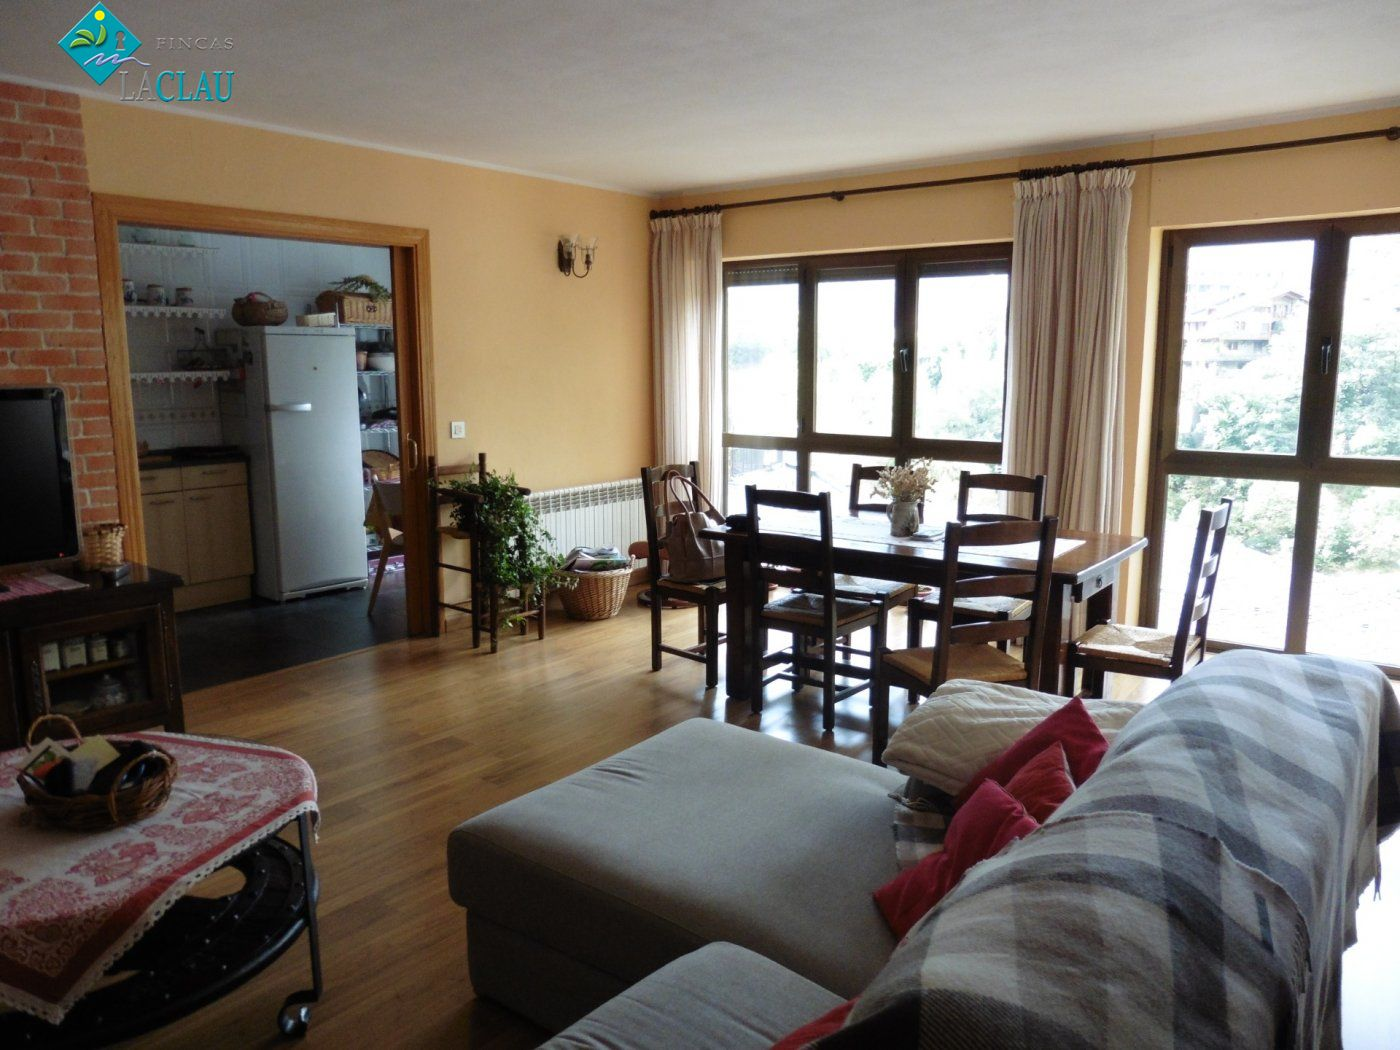 appartement en escaldes · els-vilars-d-engordany 468251€